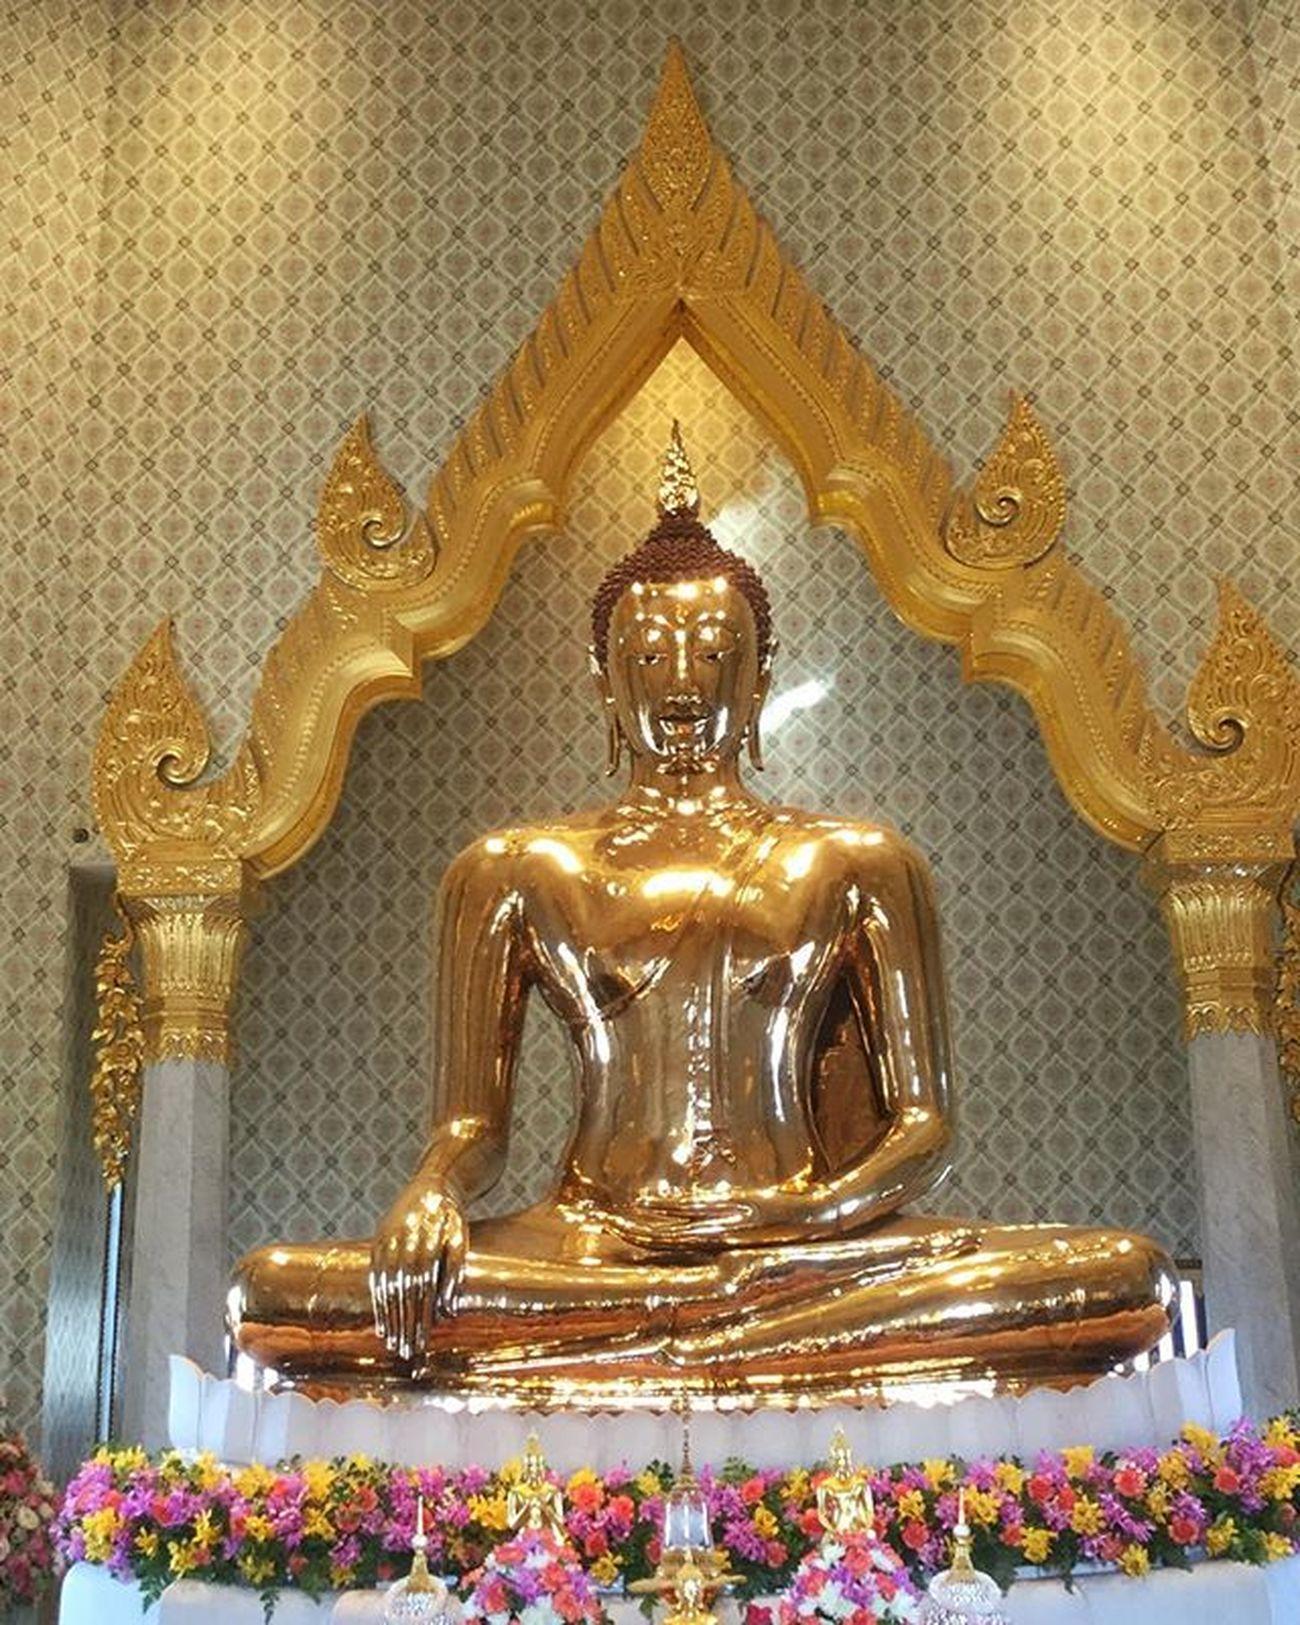 Golden Buddha - worlds largest single piece full gold idol ! Buddha Temple Goldenbuddha 5tonnesgold Divine Peaceful Templesofthailand Wattirmitr Bangkok Tourdiaries Touristlife Thailand Insta_thailand